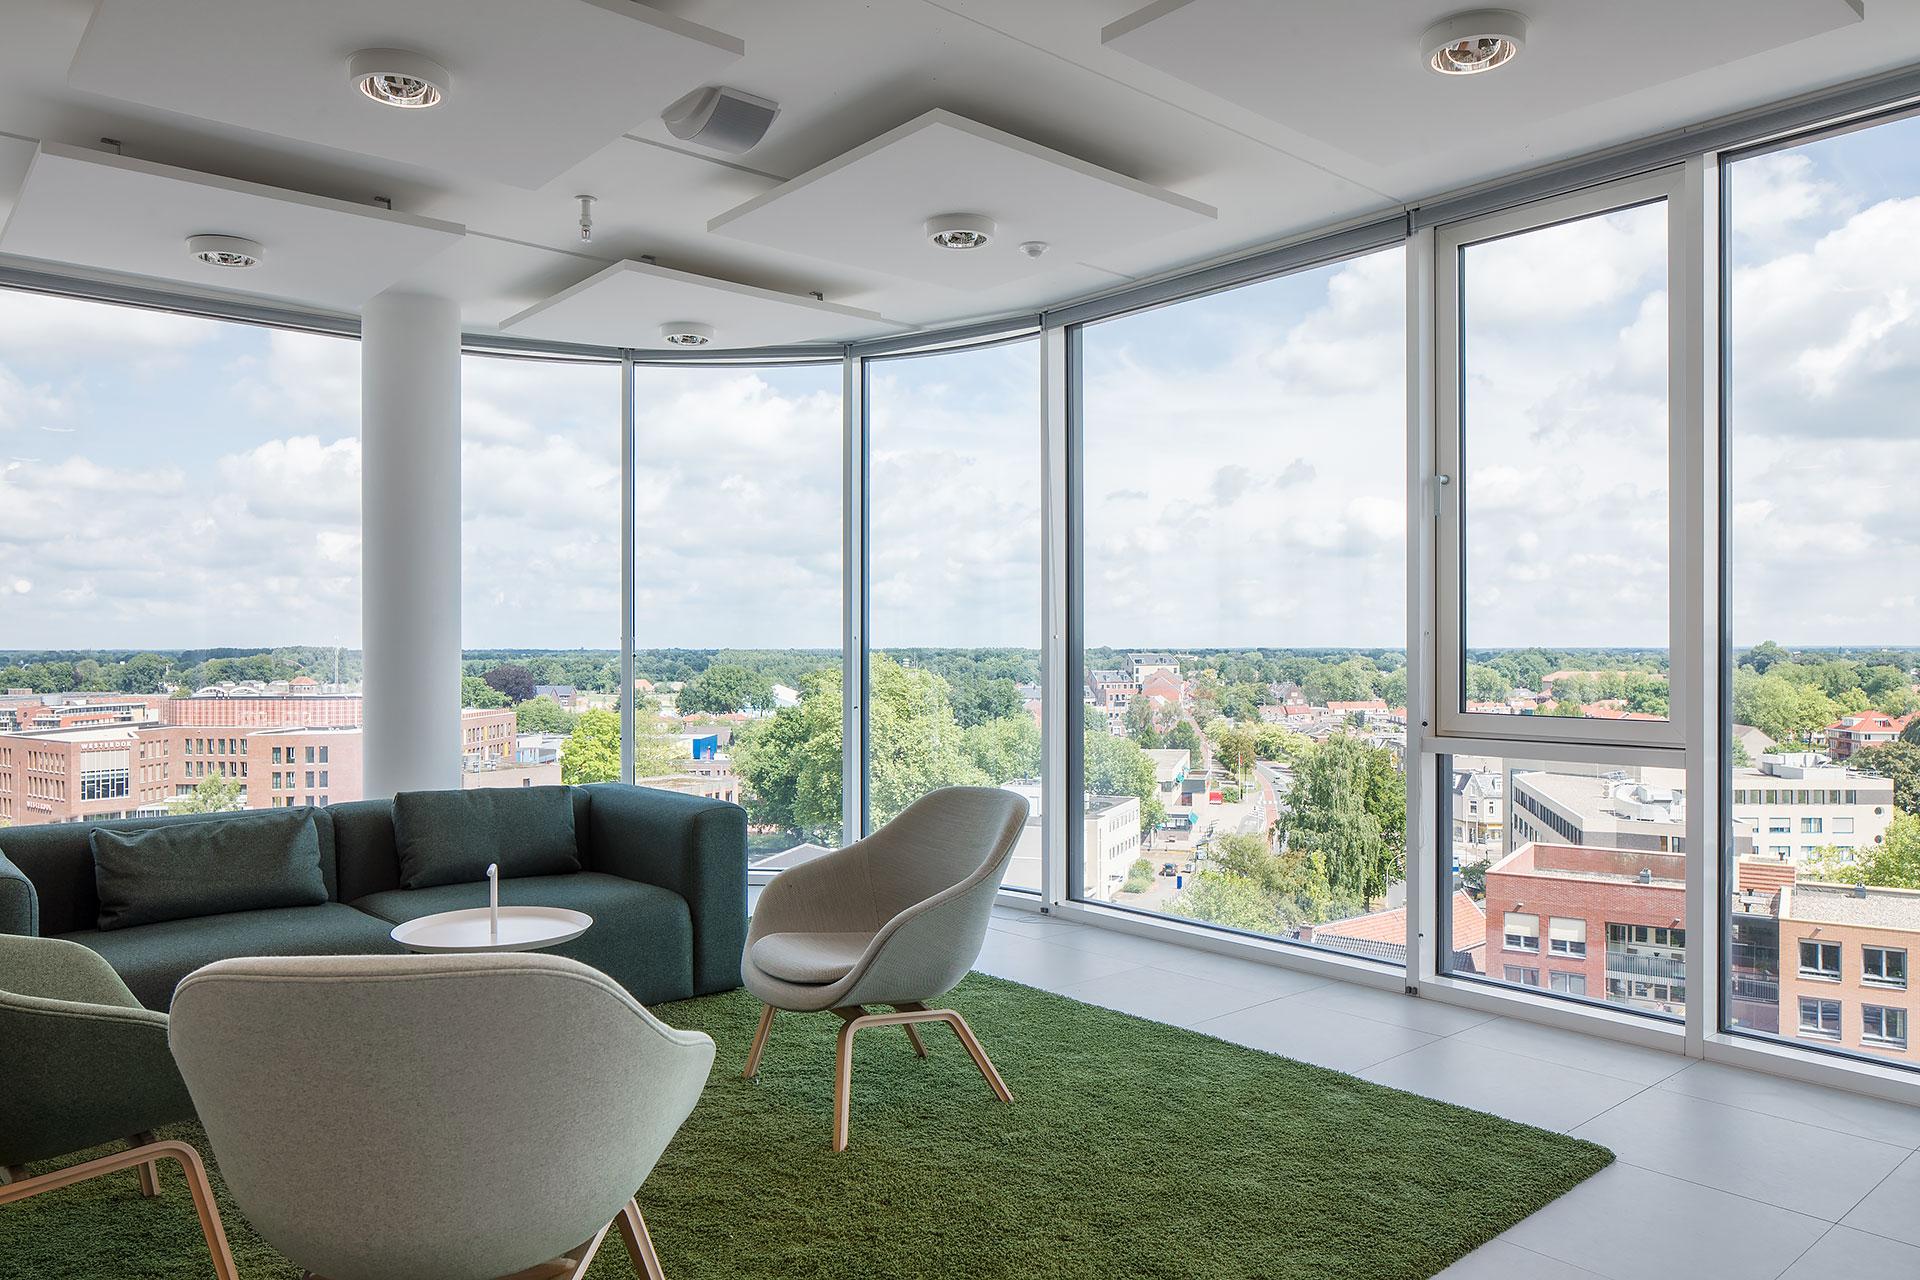 SP2015-Stadhuis-Almelo-architectuurfoto-18